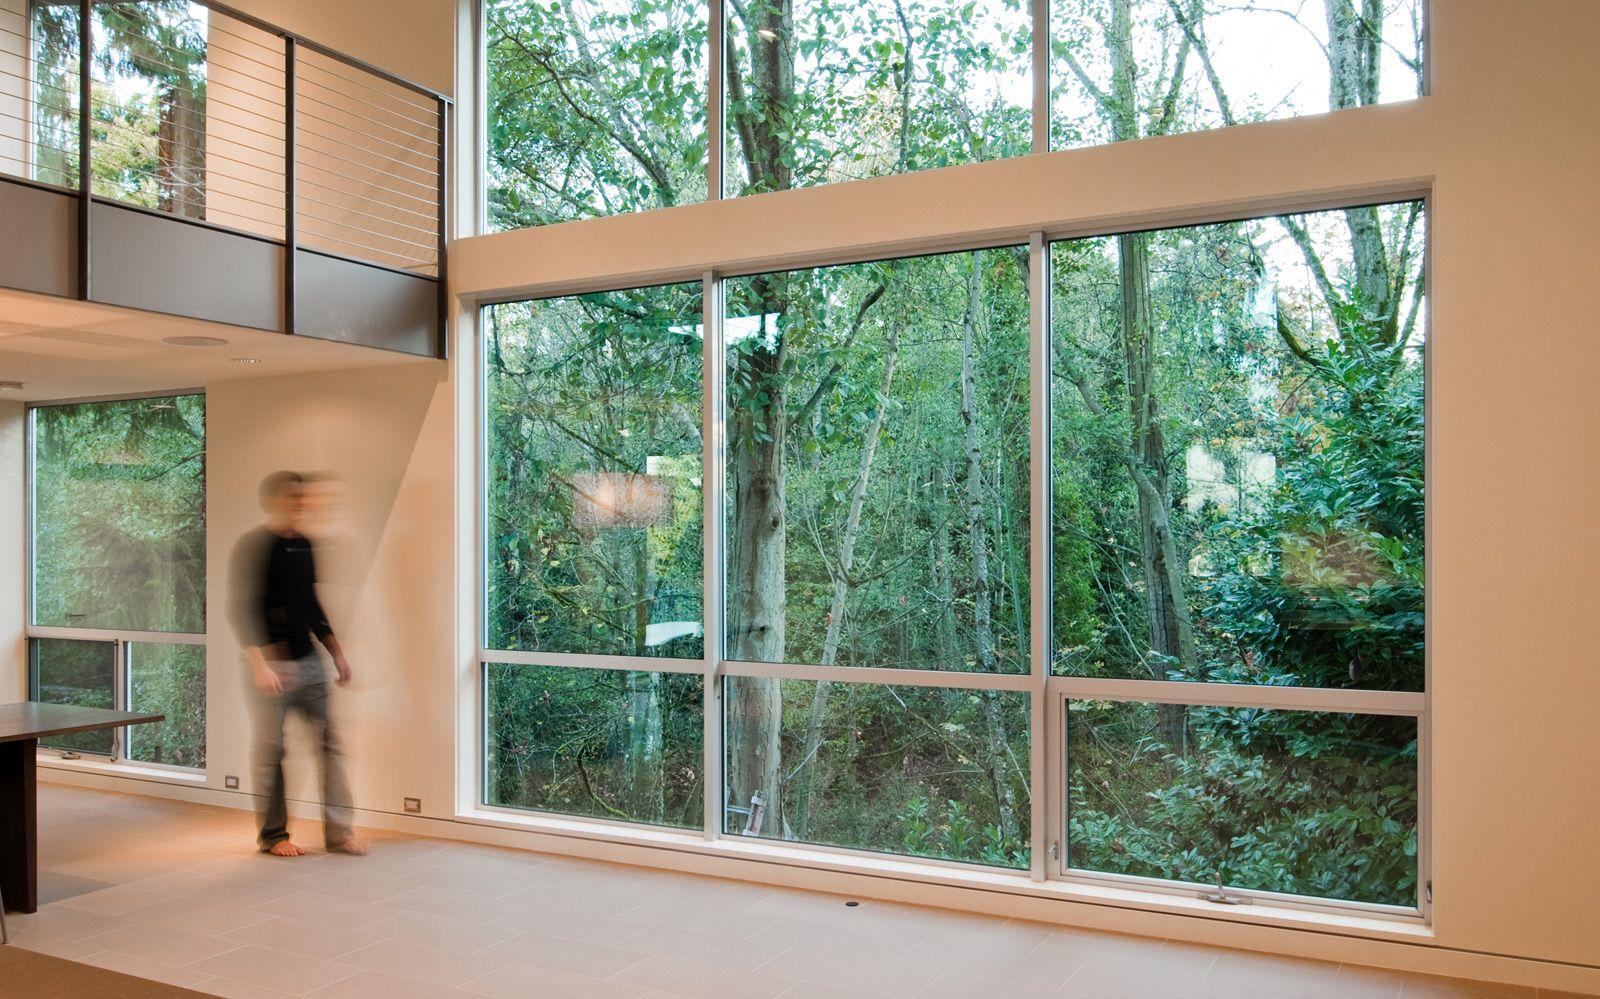 Build Llc Csh01 Living 02 Aluminium Windows Building A House